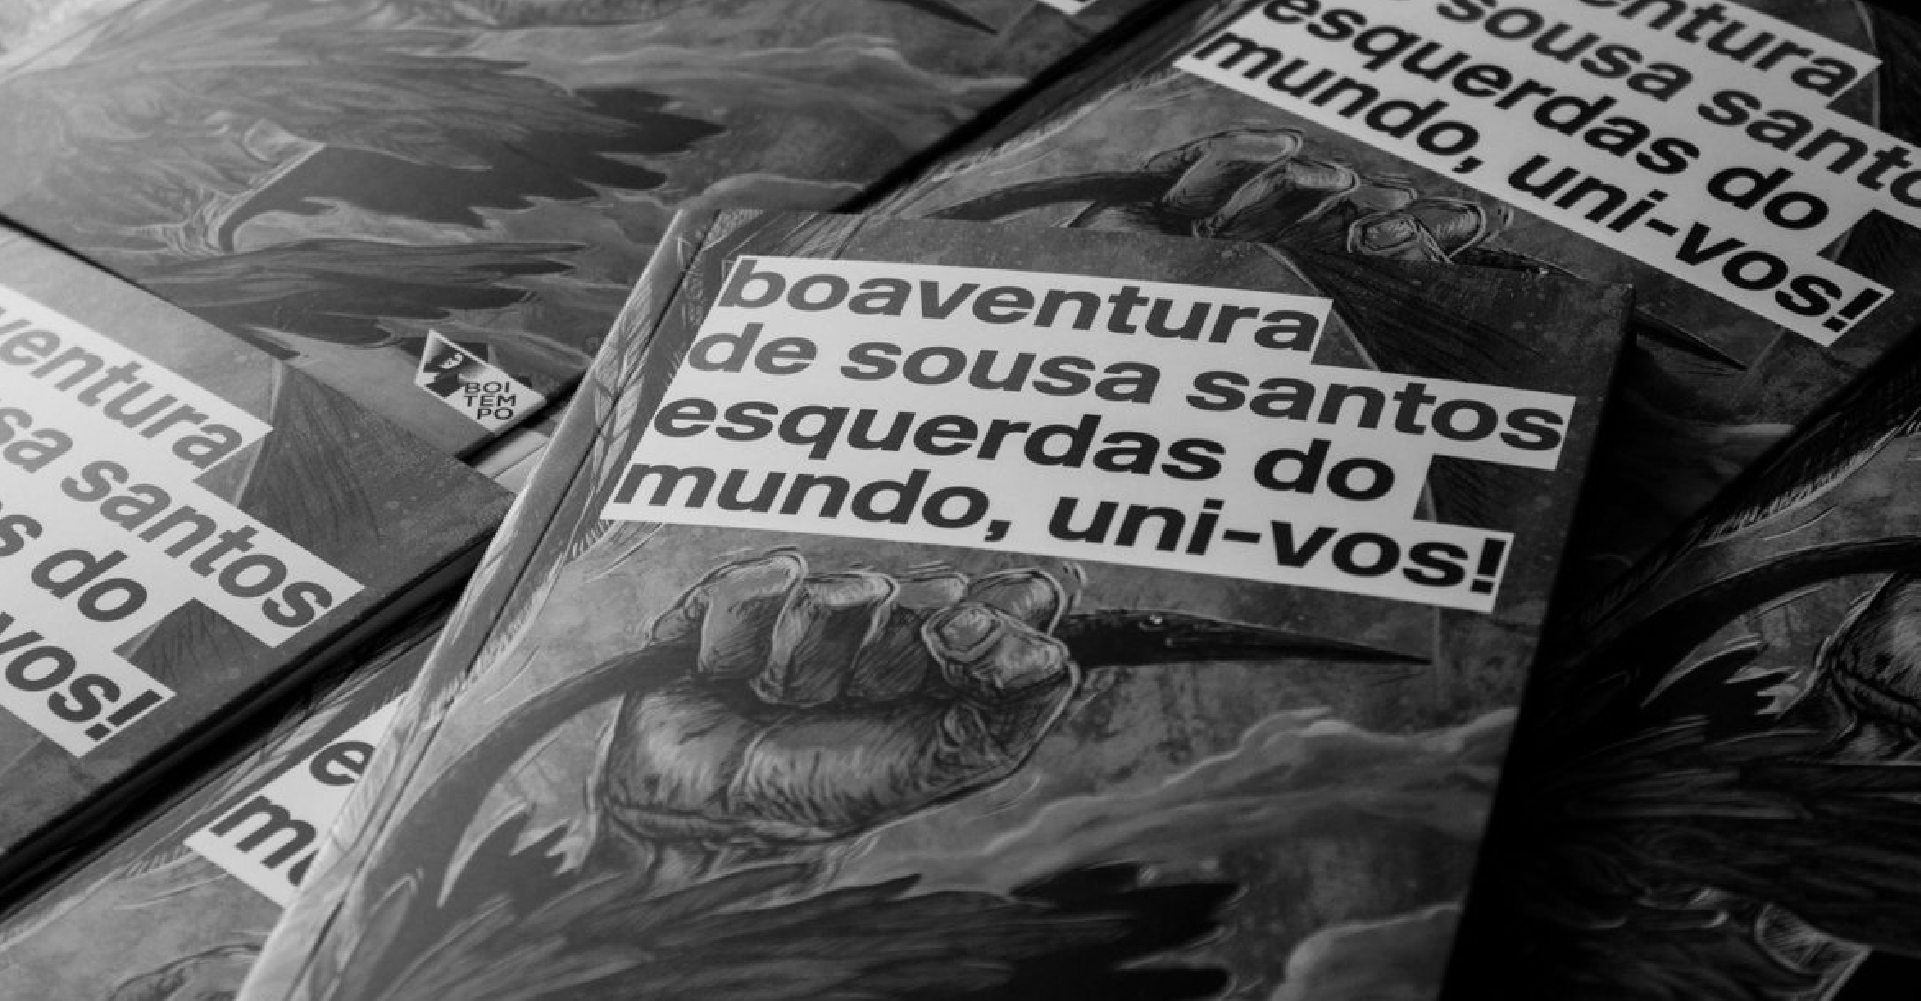 Boaventura de Sousa Santos lança livro na CLDF nesta quinta, dia 24